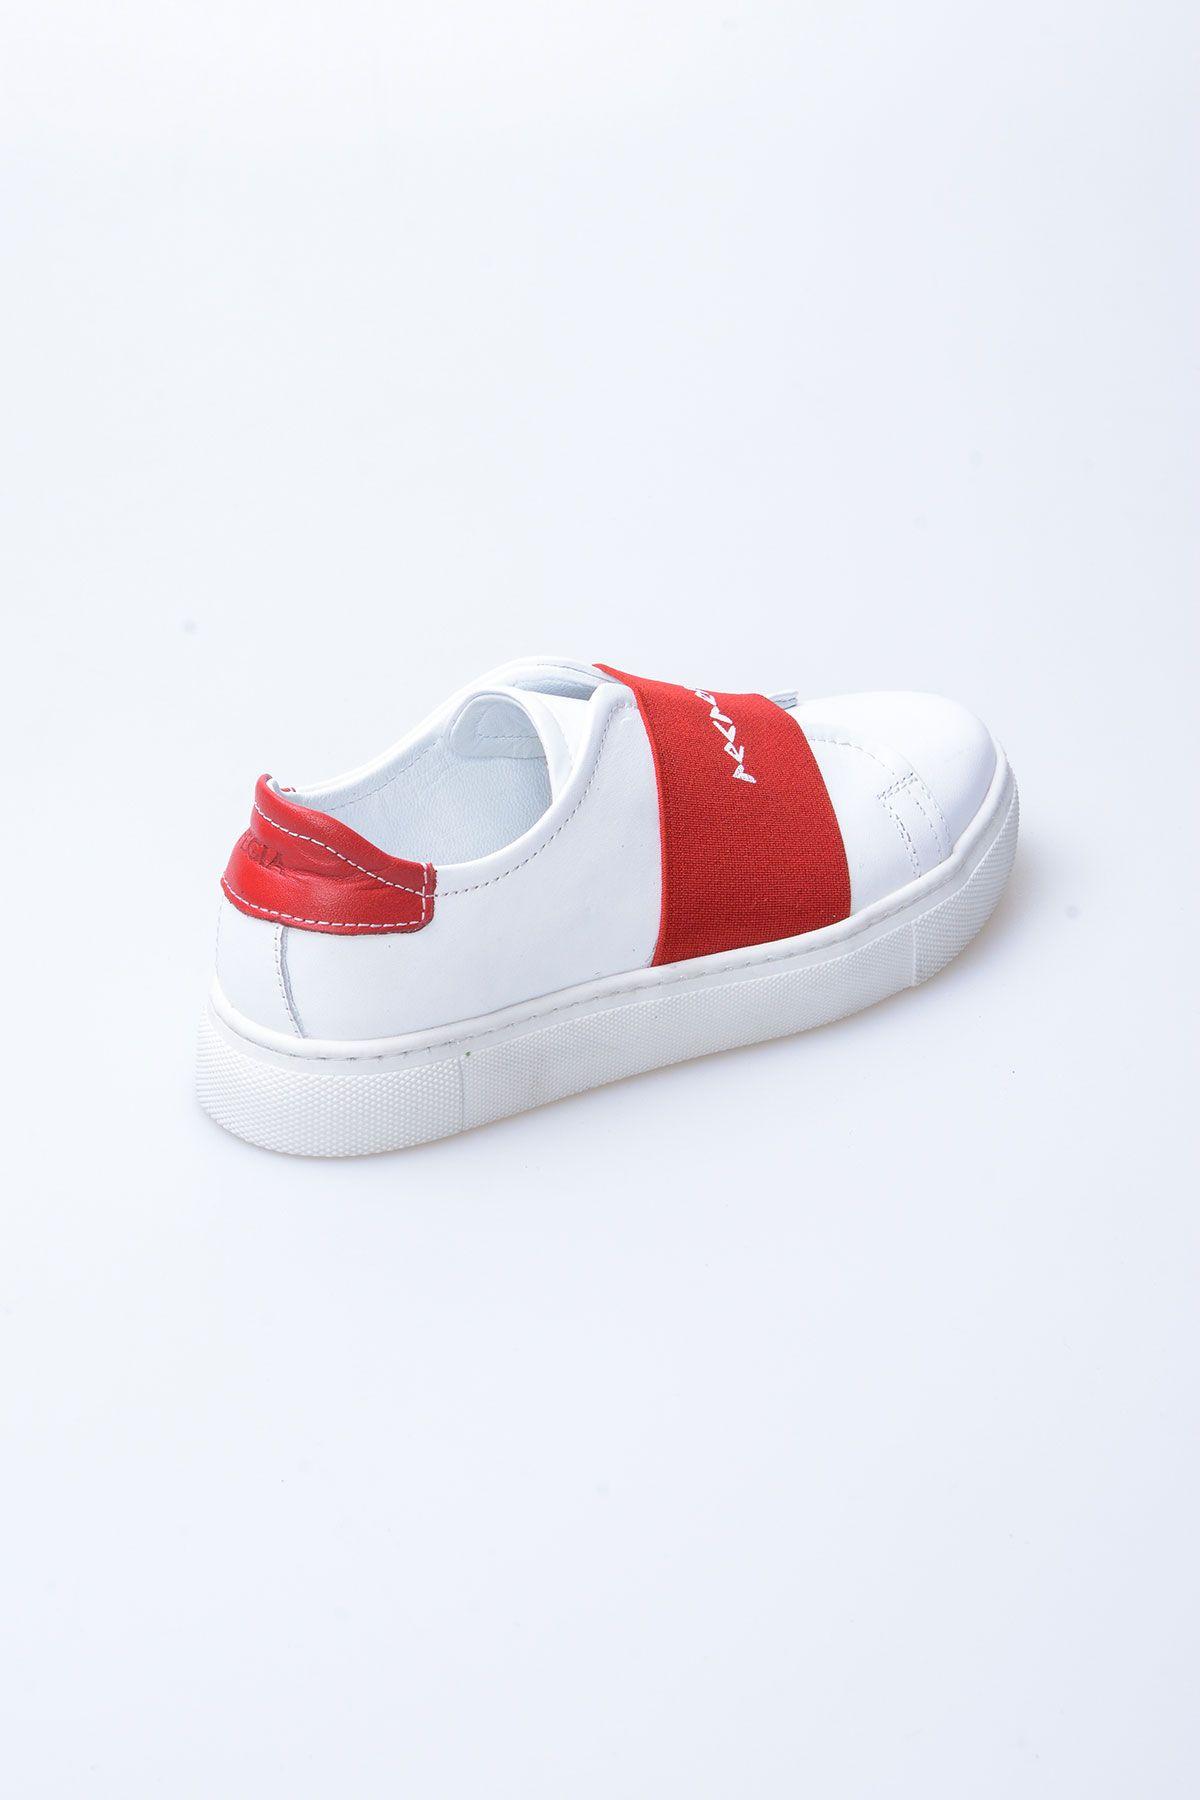 Pegia Recreation Hakiki Deri Bayan Sneaker 19REC101 Kırmızı